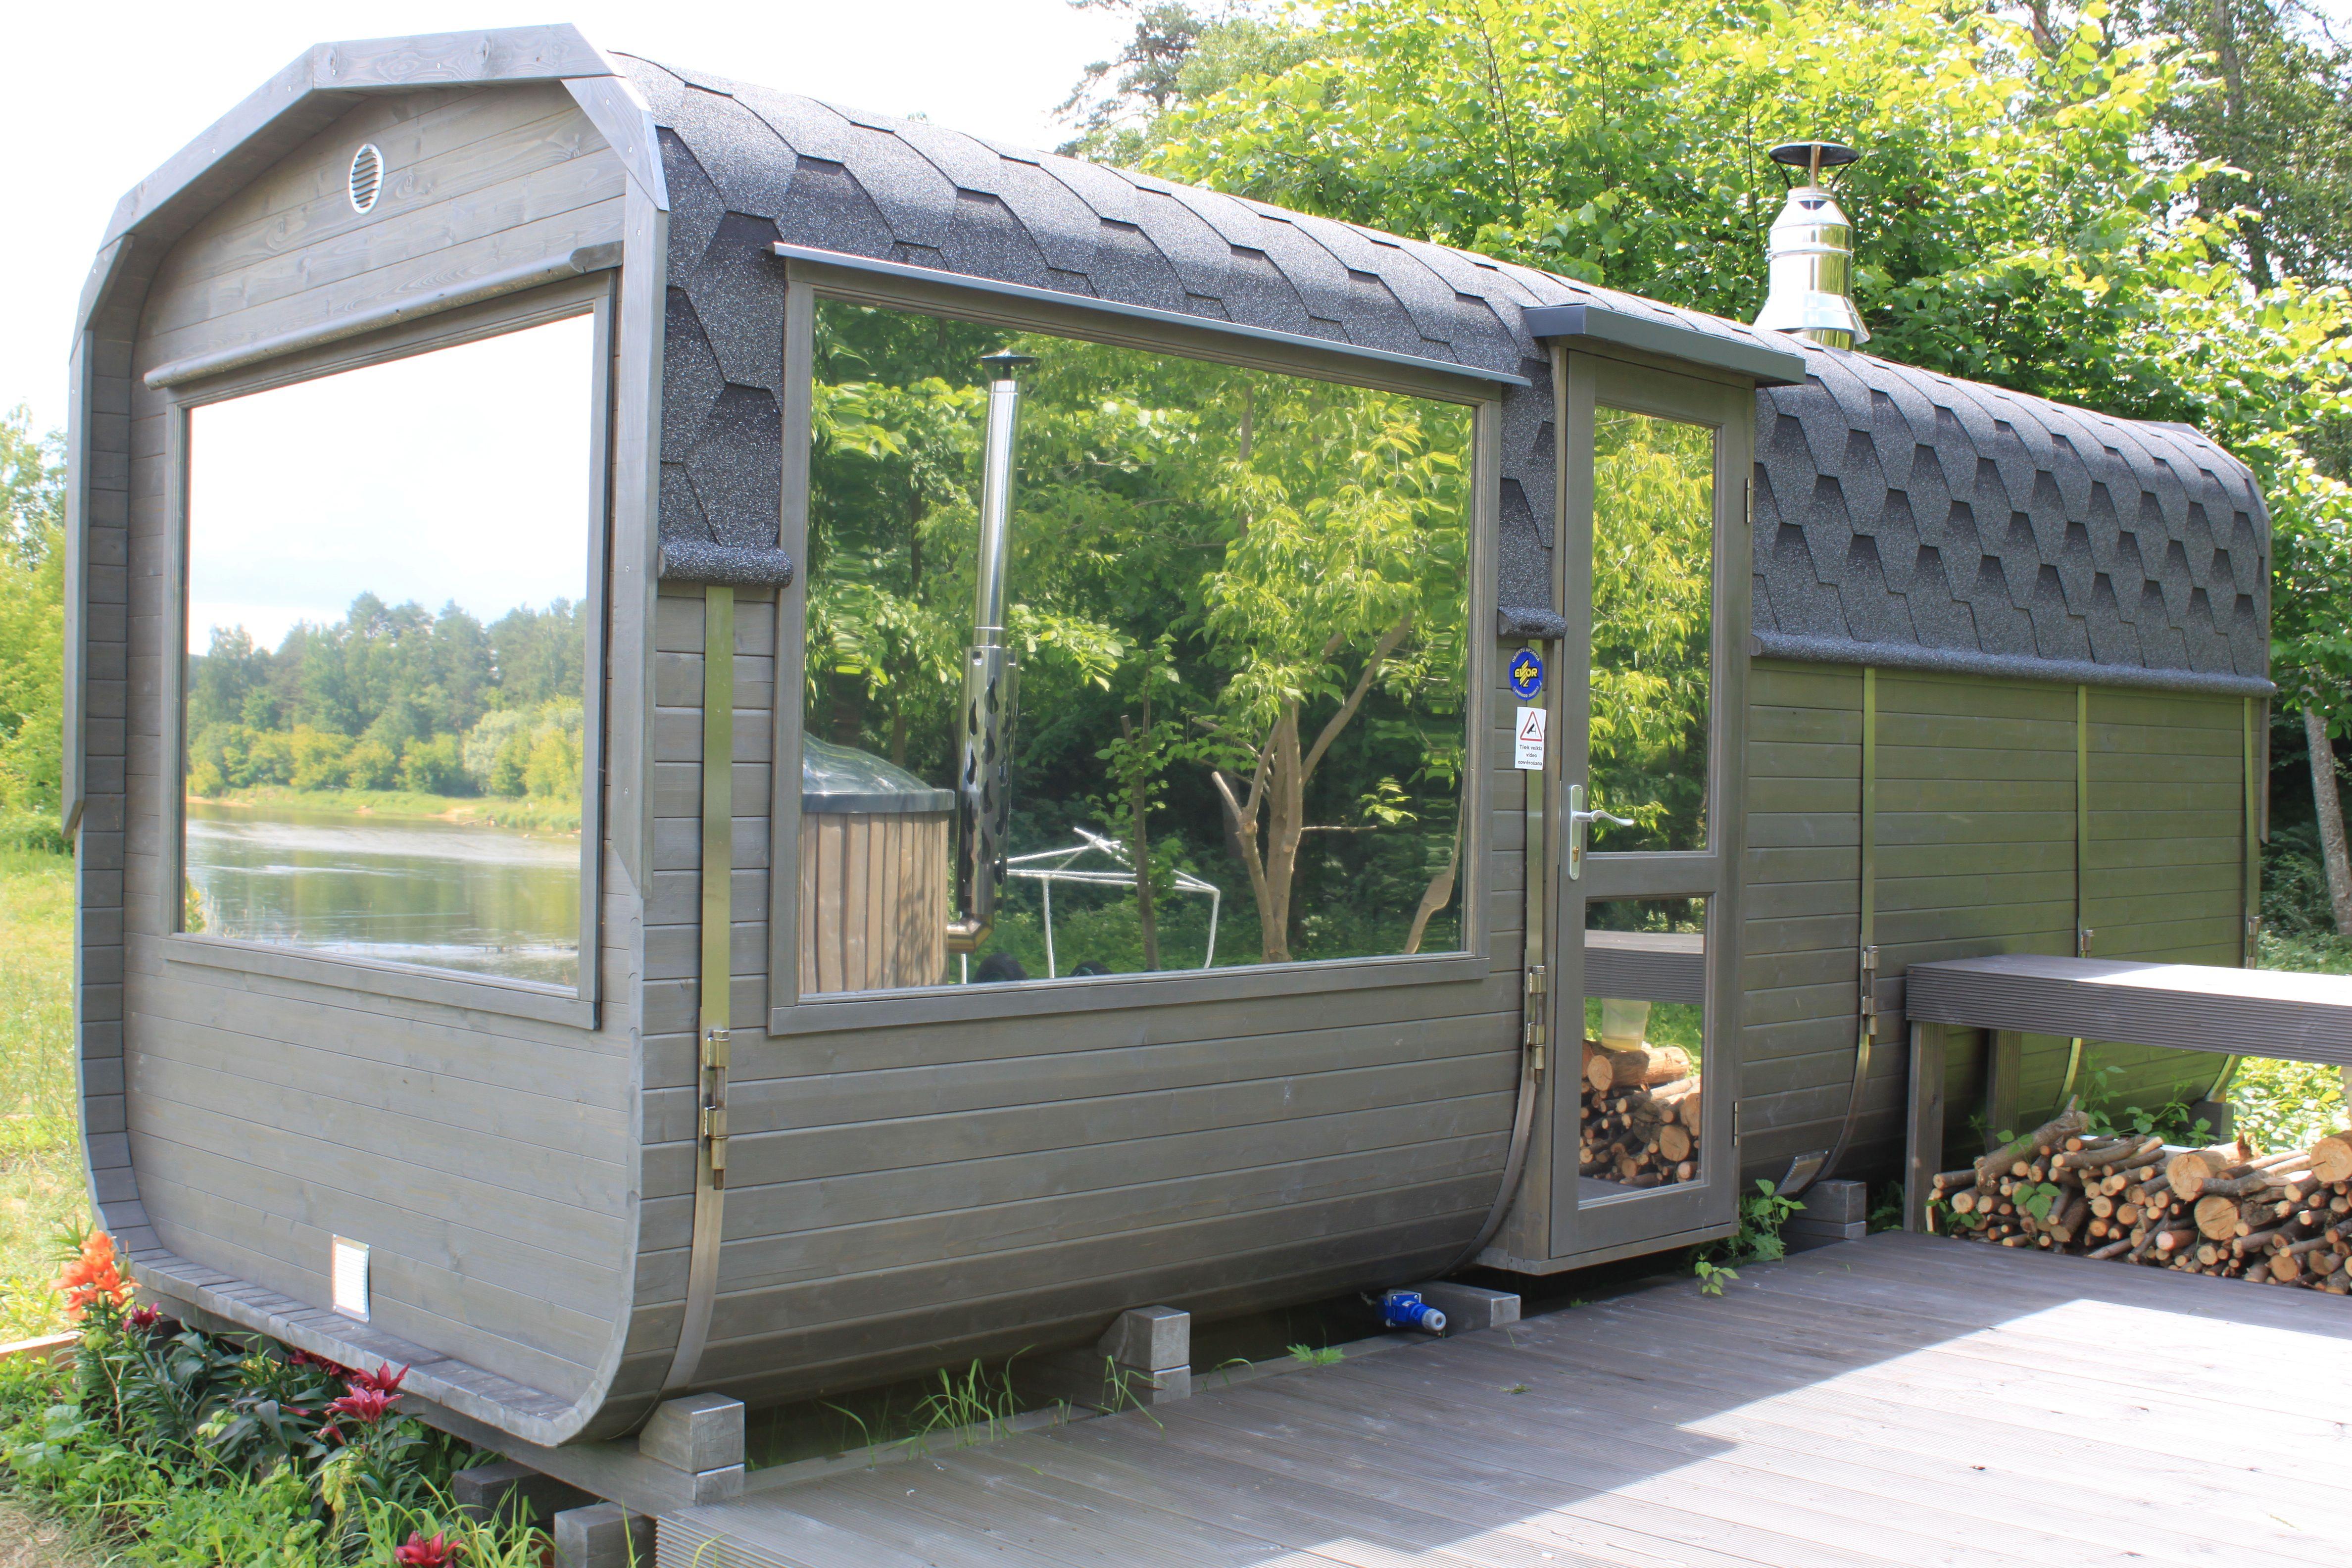 Wellness & Spa Panorama Sauna From